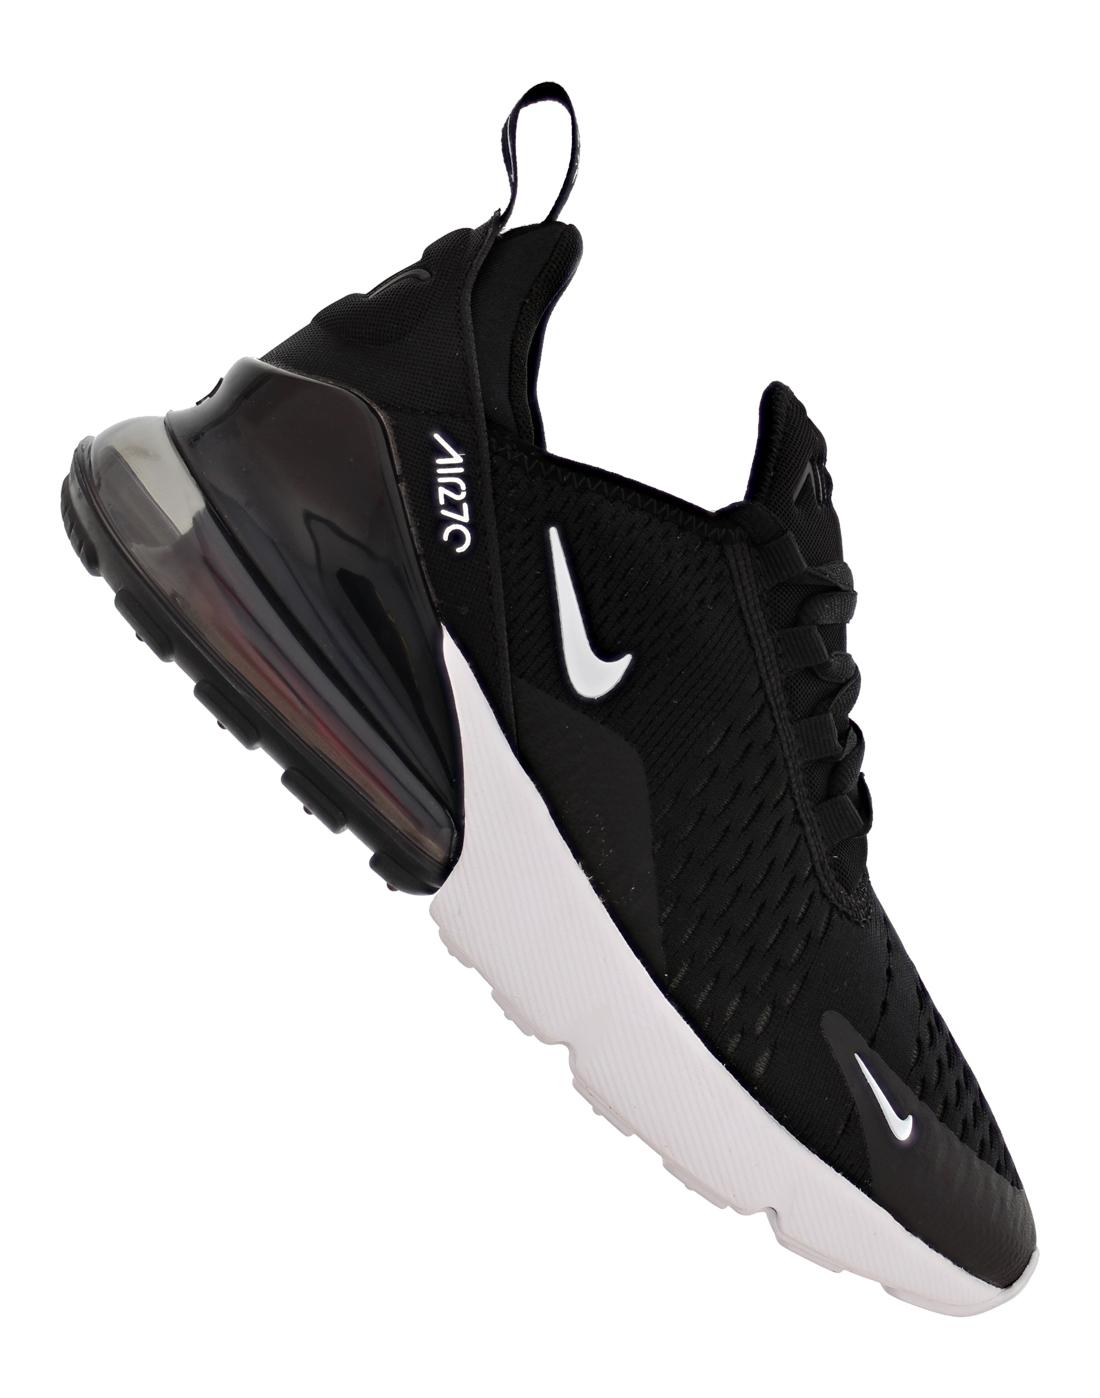 Kids Nike Air Max 270 Trainers | Black